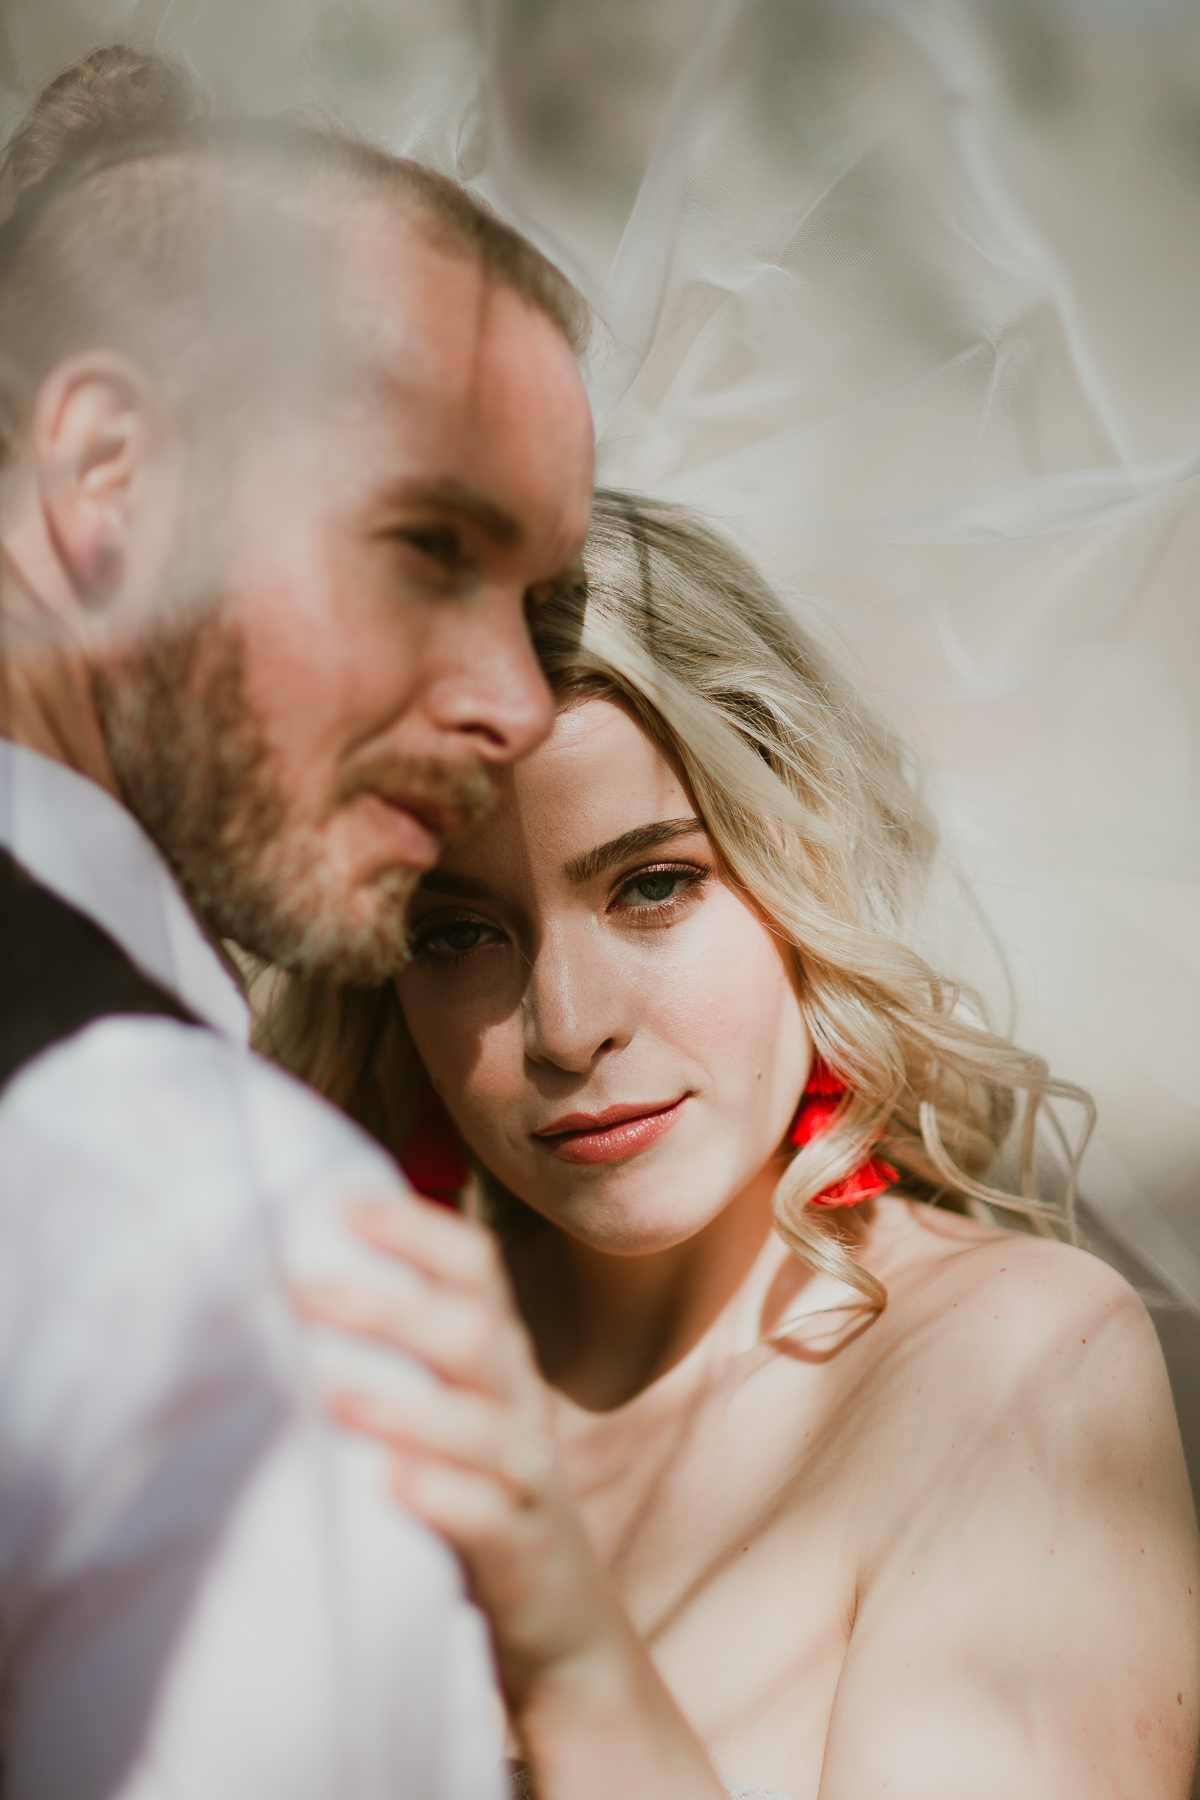 Love, shadows, beauty and weddings!